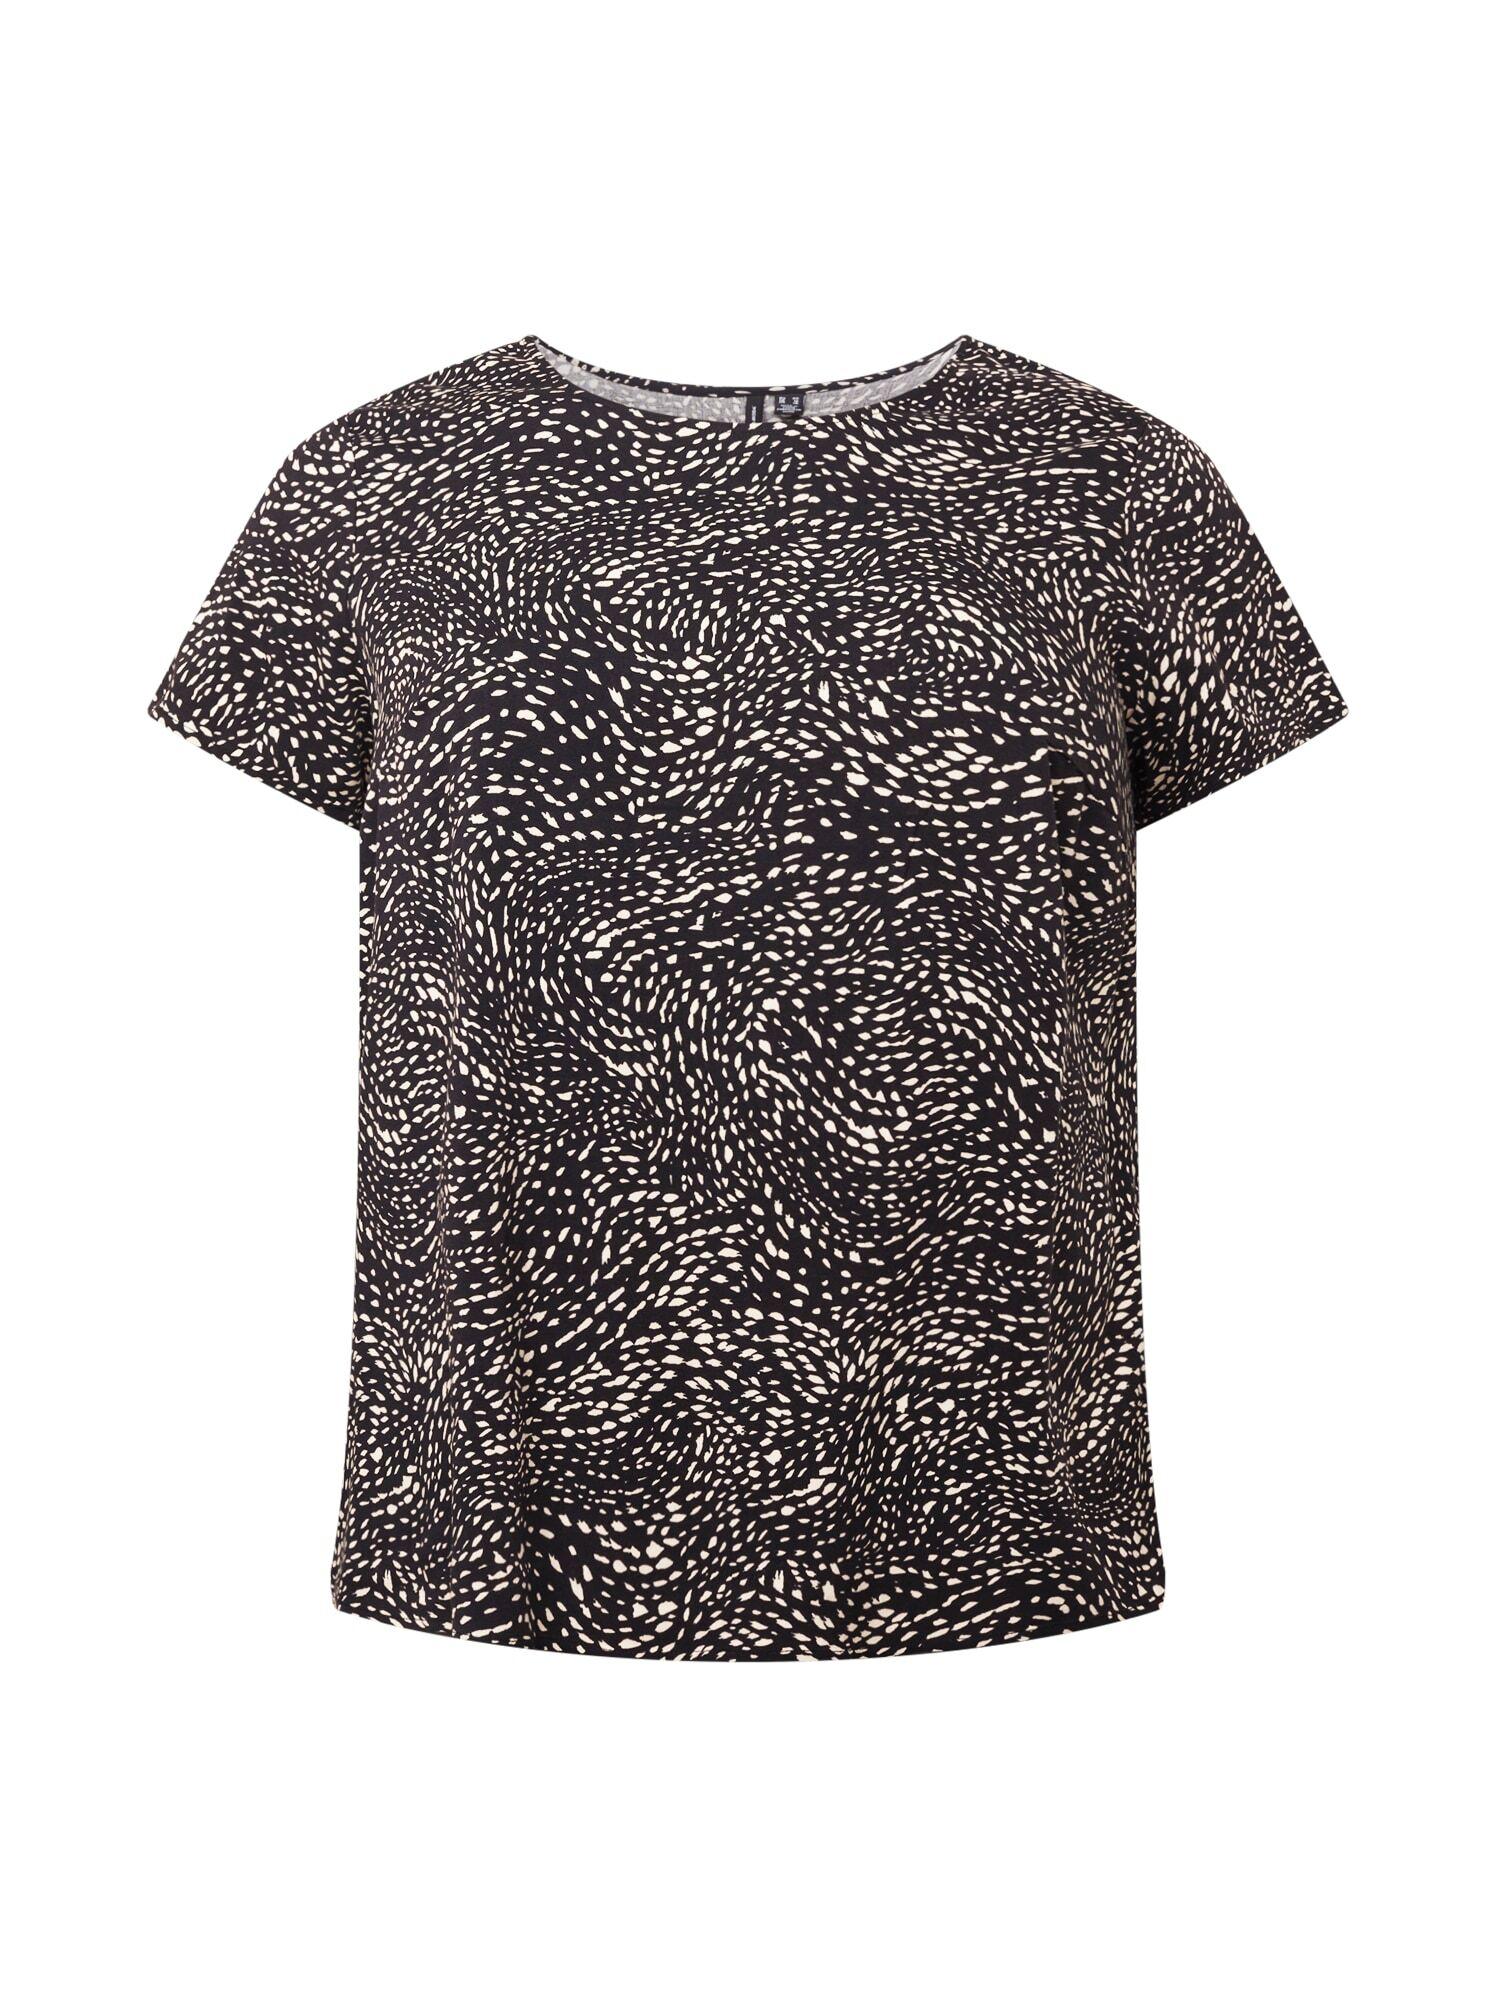 Vero Moda Curve T-shirt 'BACA'  - Noir - Taille: 42 - female